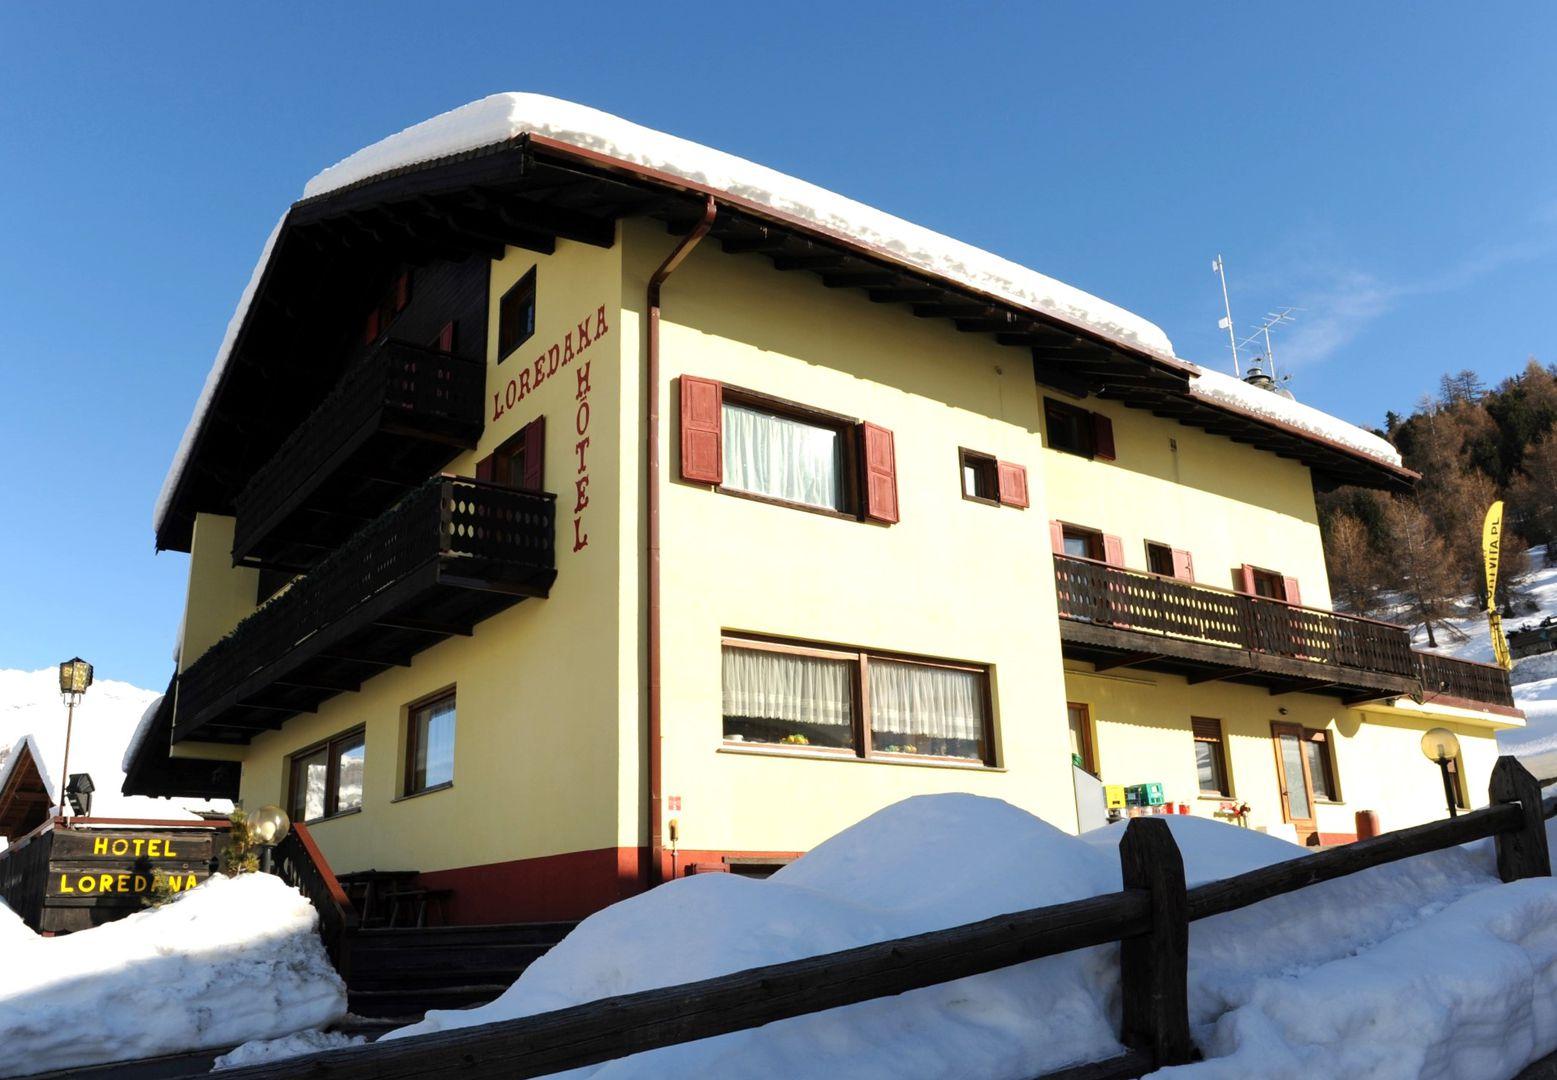 Hotel Loredana